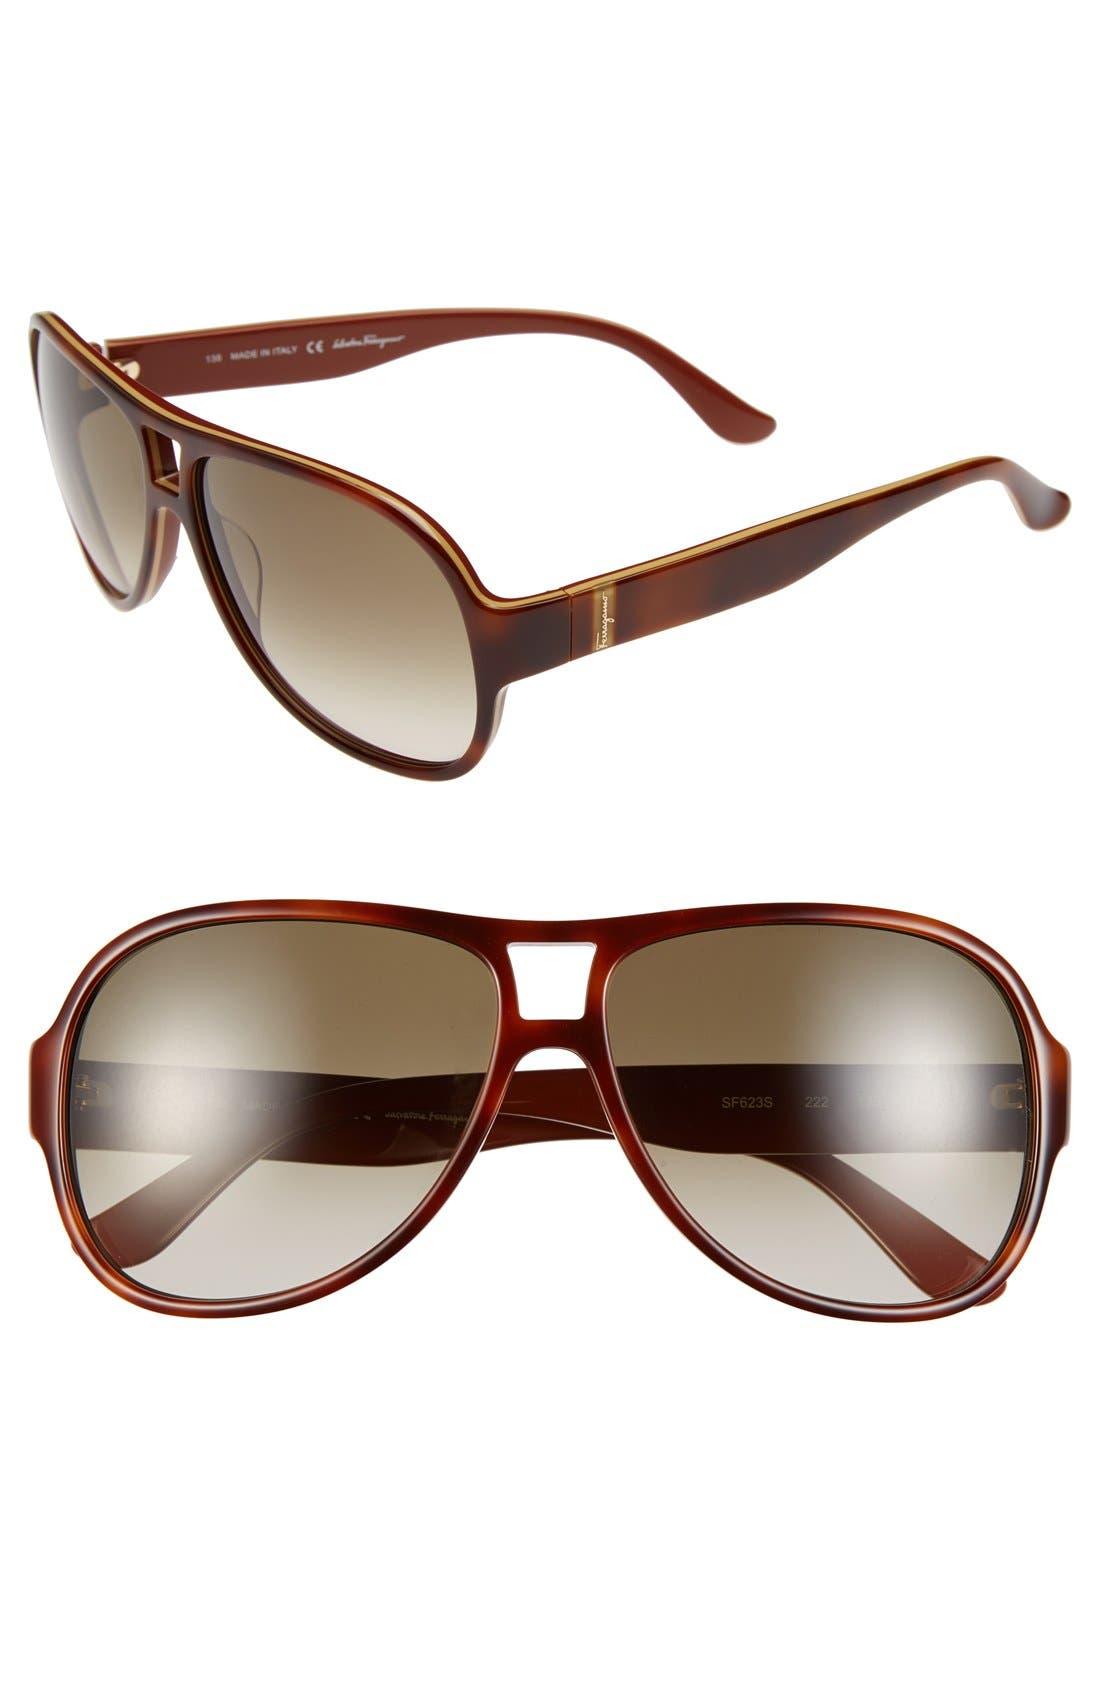 Alternate Image 1 Selected - Salvatore Ferragamo 59mm Aviator Sunglasses